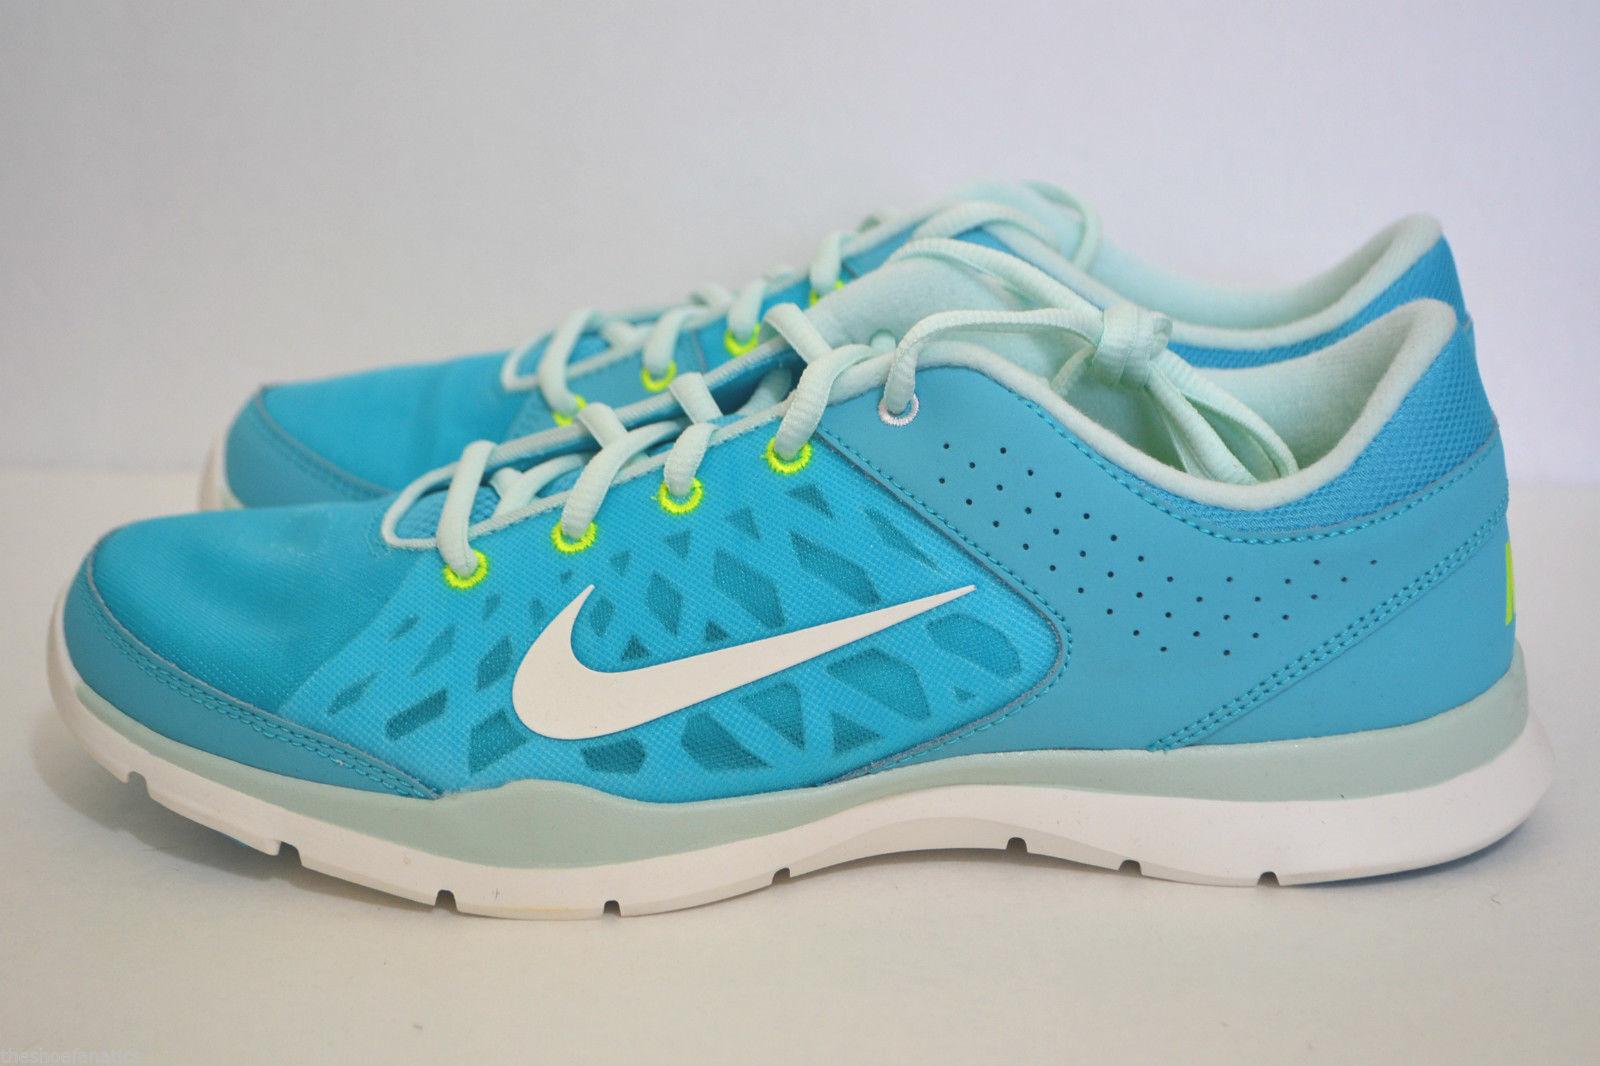 Nike Wmns Flex Trainer 3 Gamma bleu Trainers Shoes